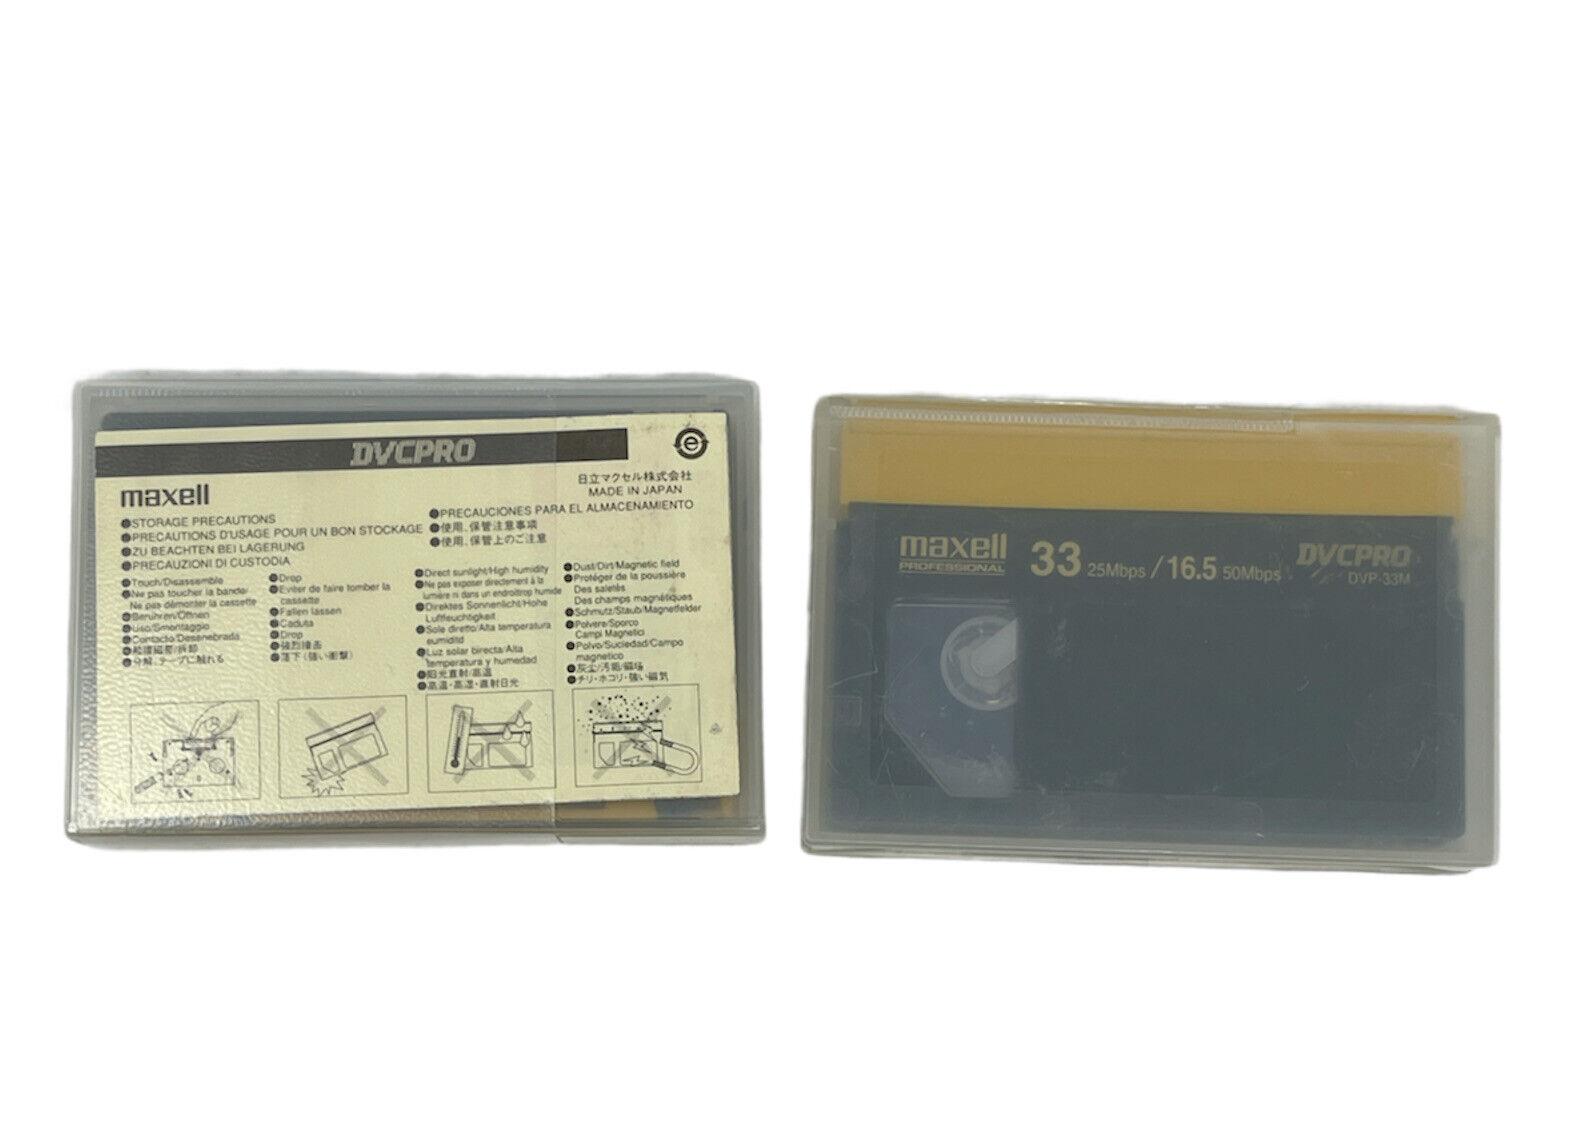 Lot Of 2 New Maxell DVCPRO DVP-33M Digital Video Cassettes